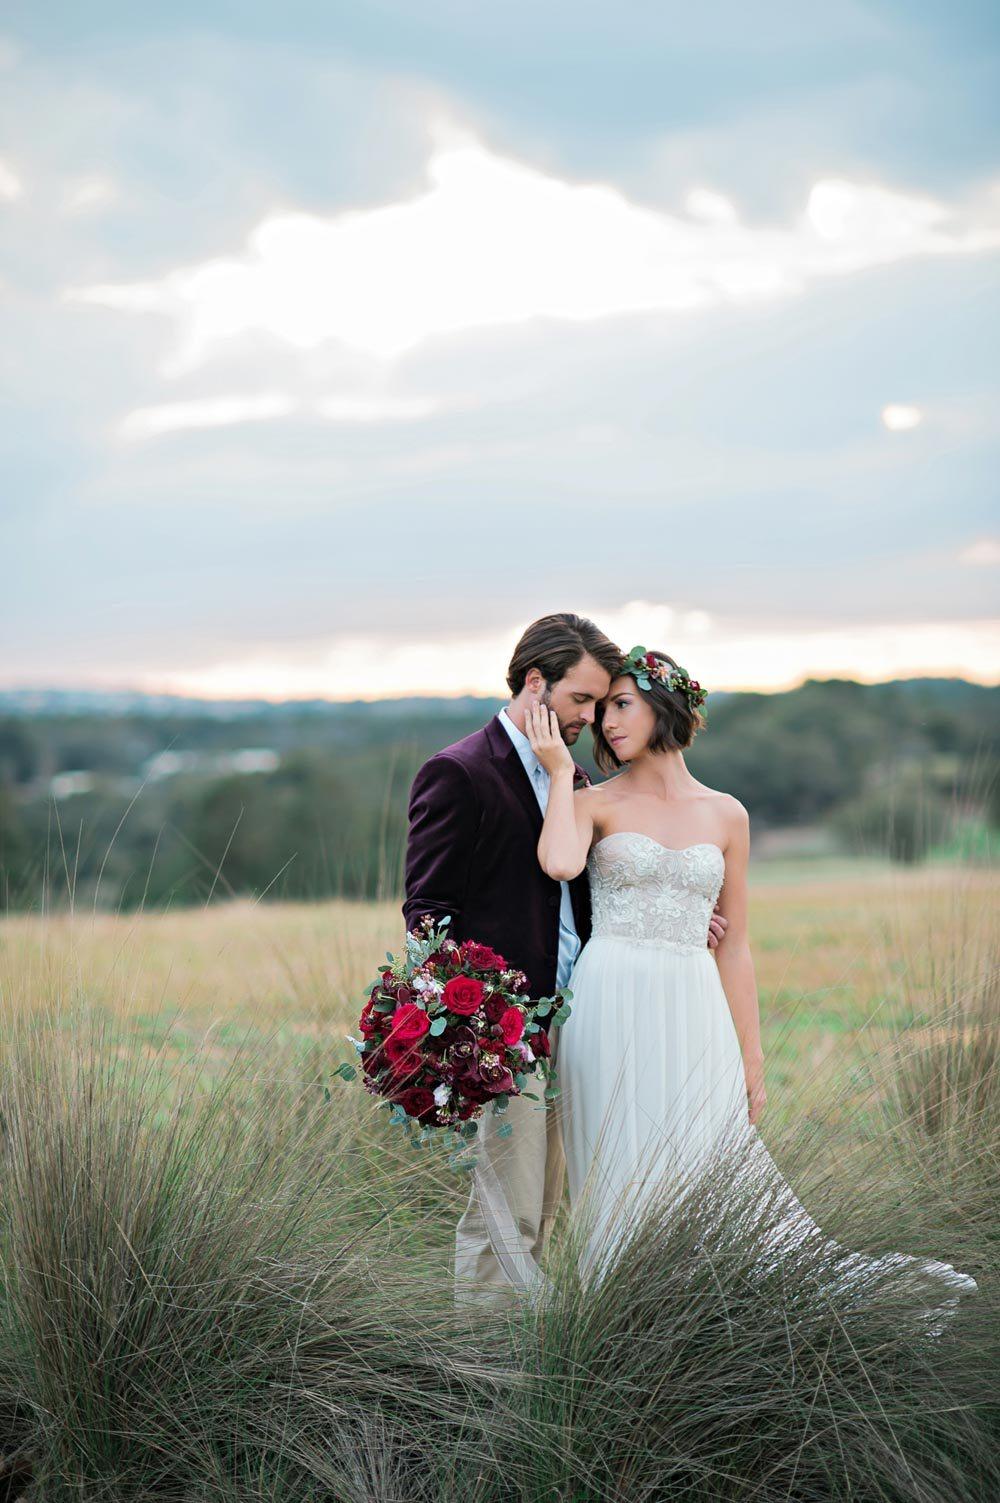 bride and groom italian maroon themed wedding inspiration